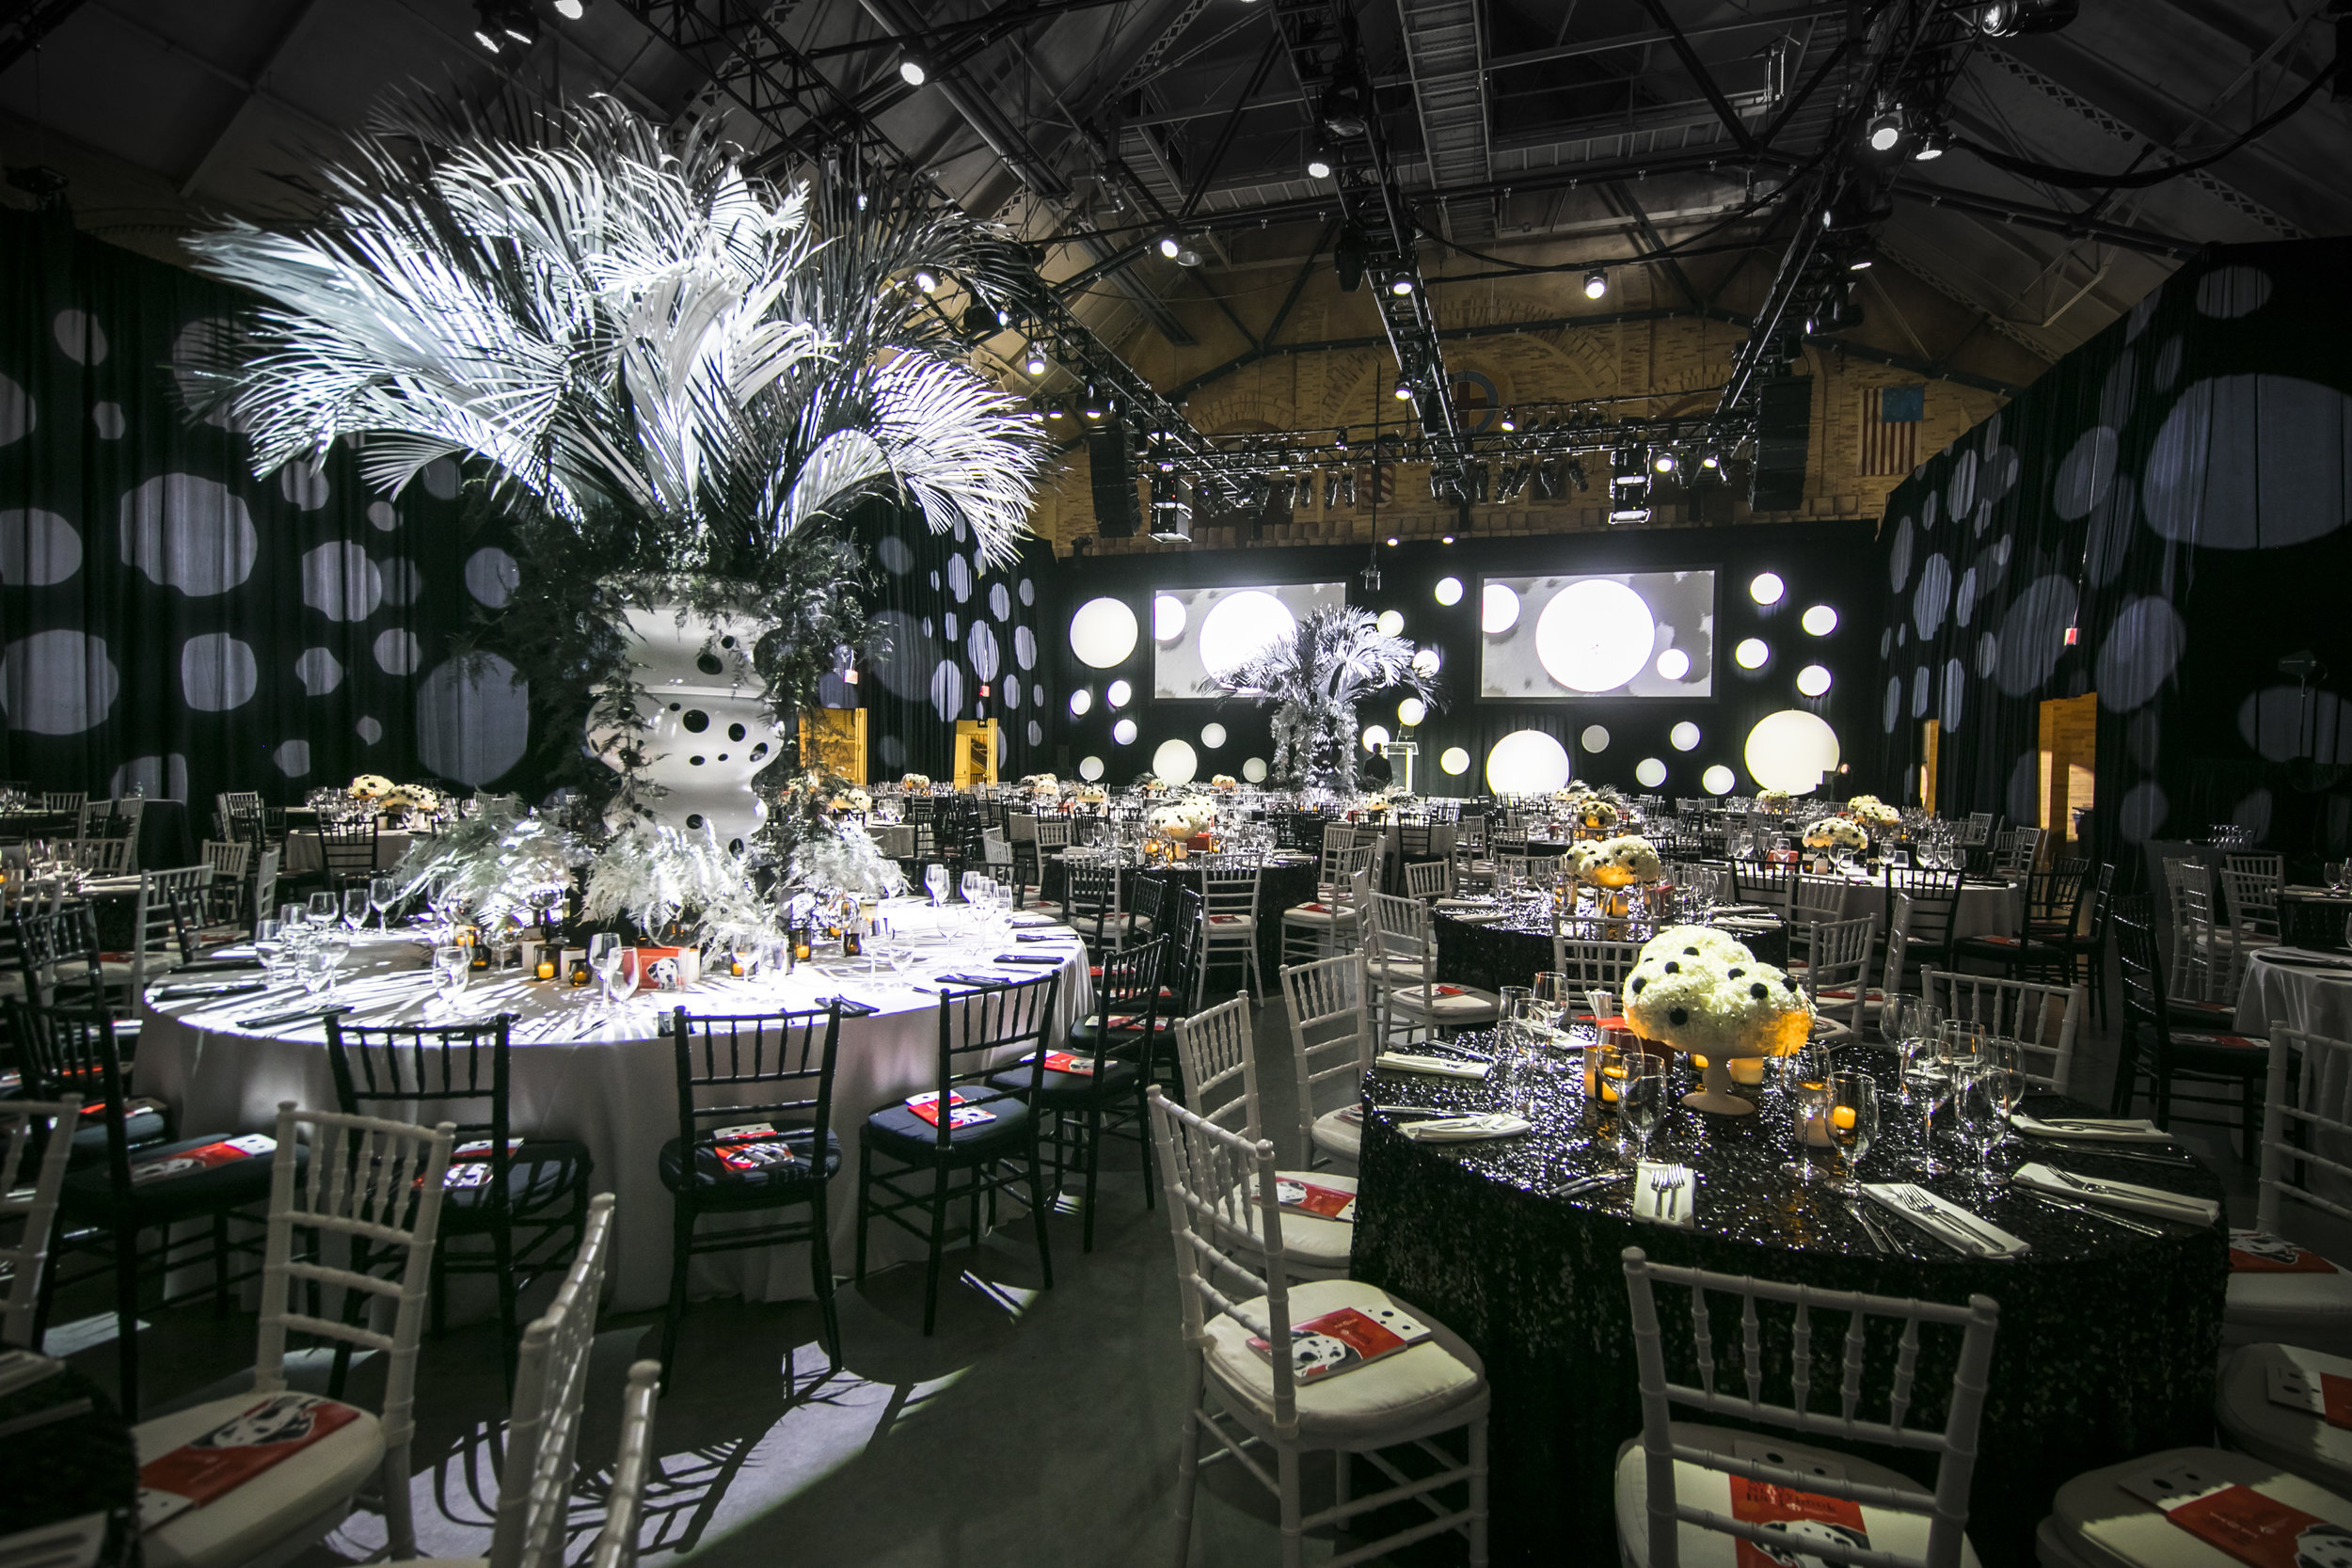 Rafanelli Events Port Lighting Systems Black and White Table Spotlights 2.jpg